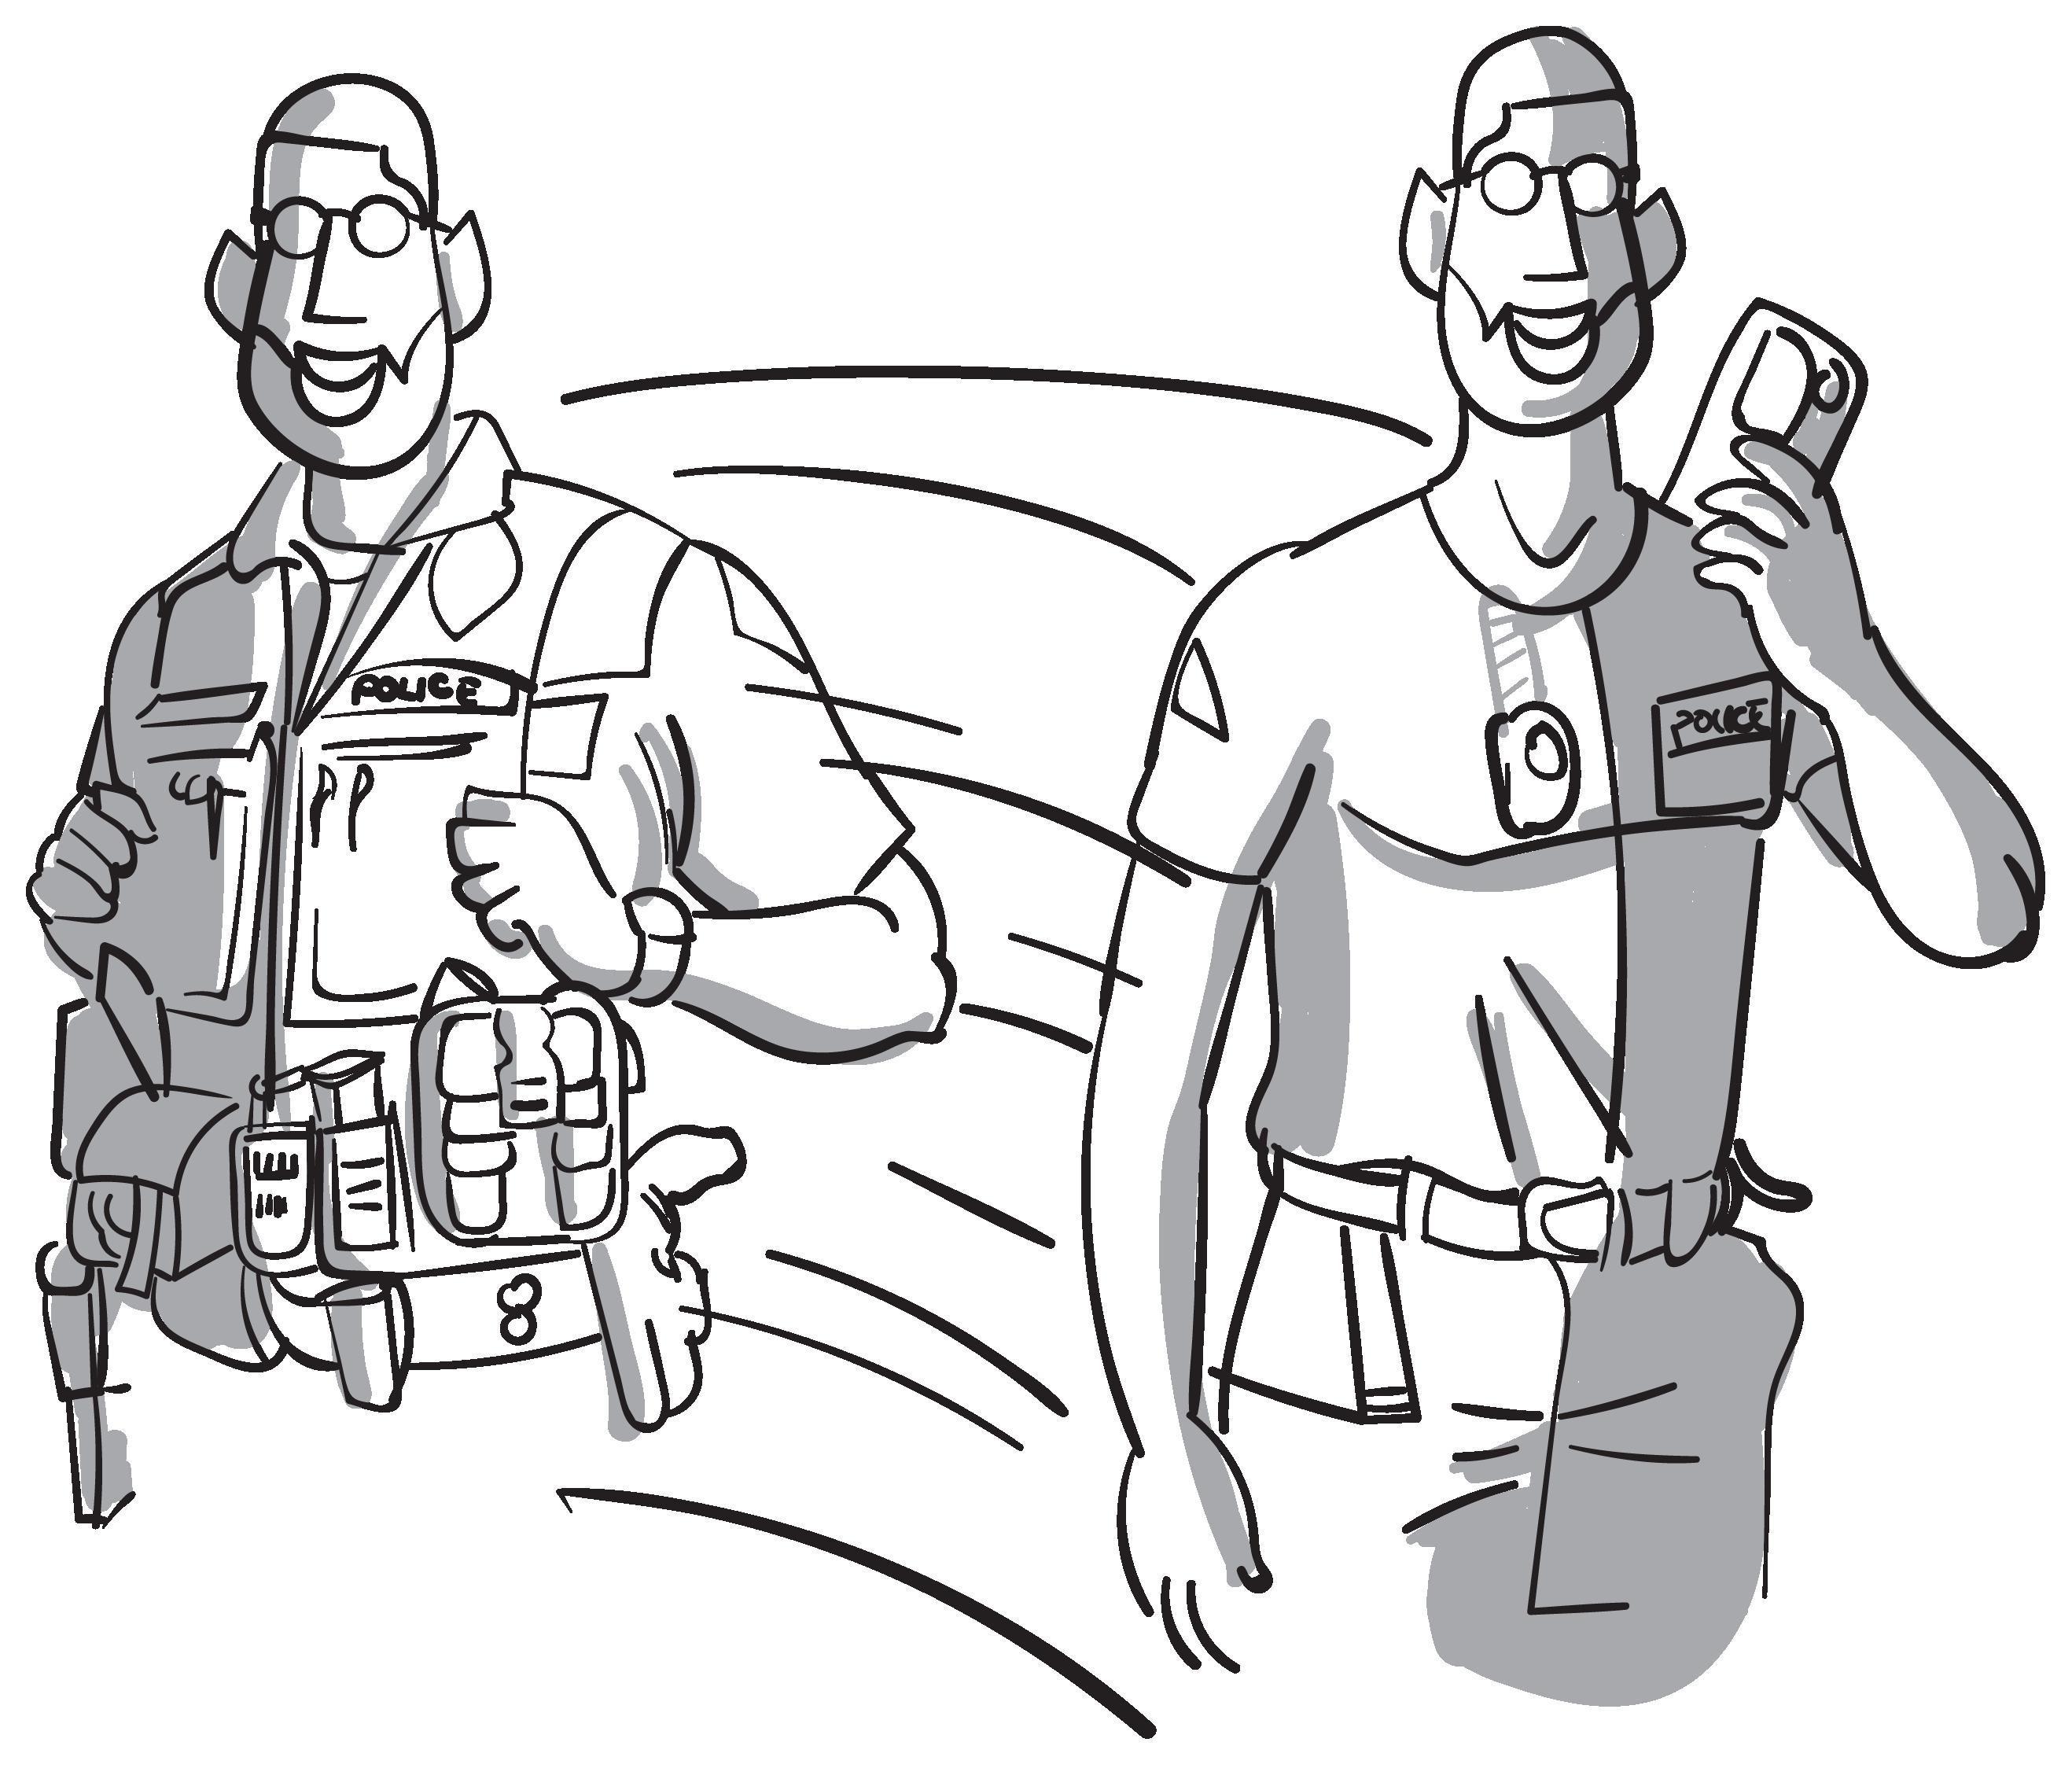 Future of Police